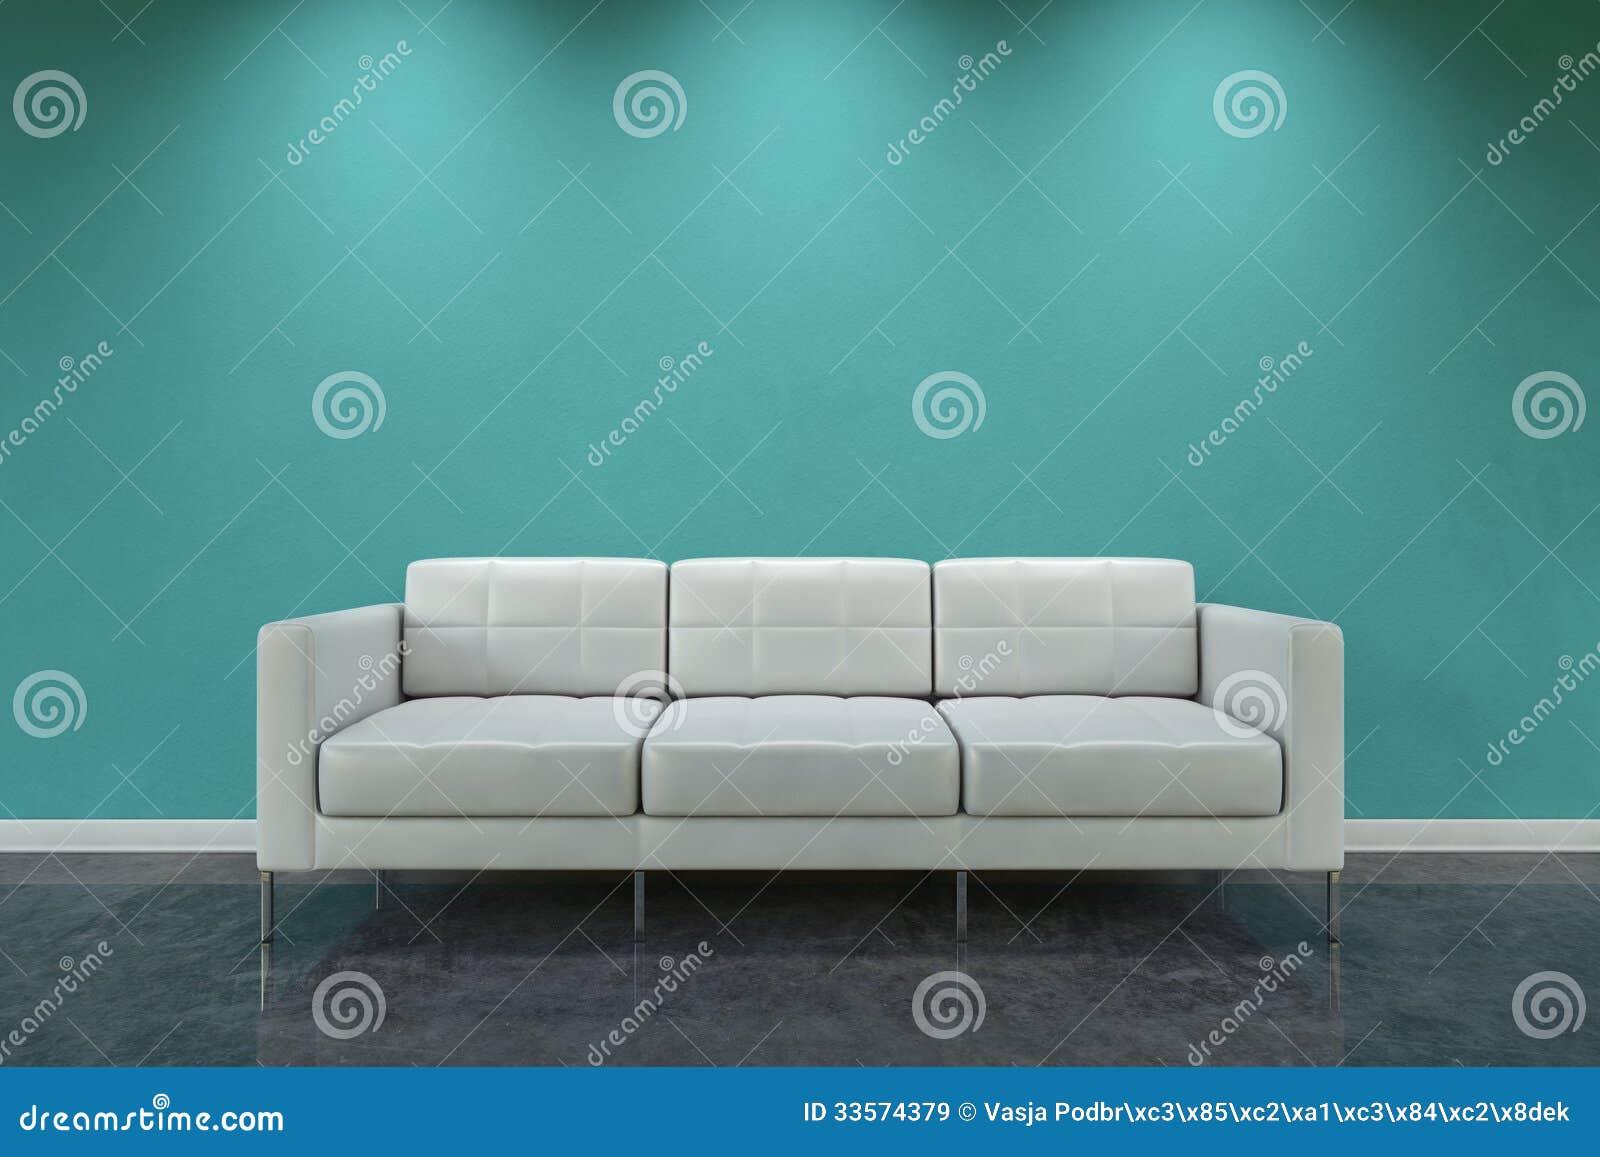 White Sofa Royalty Free Stock Images Image 33574379